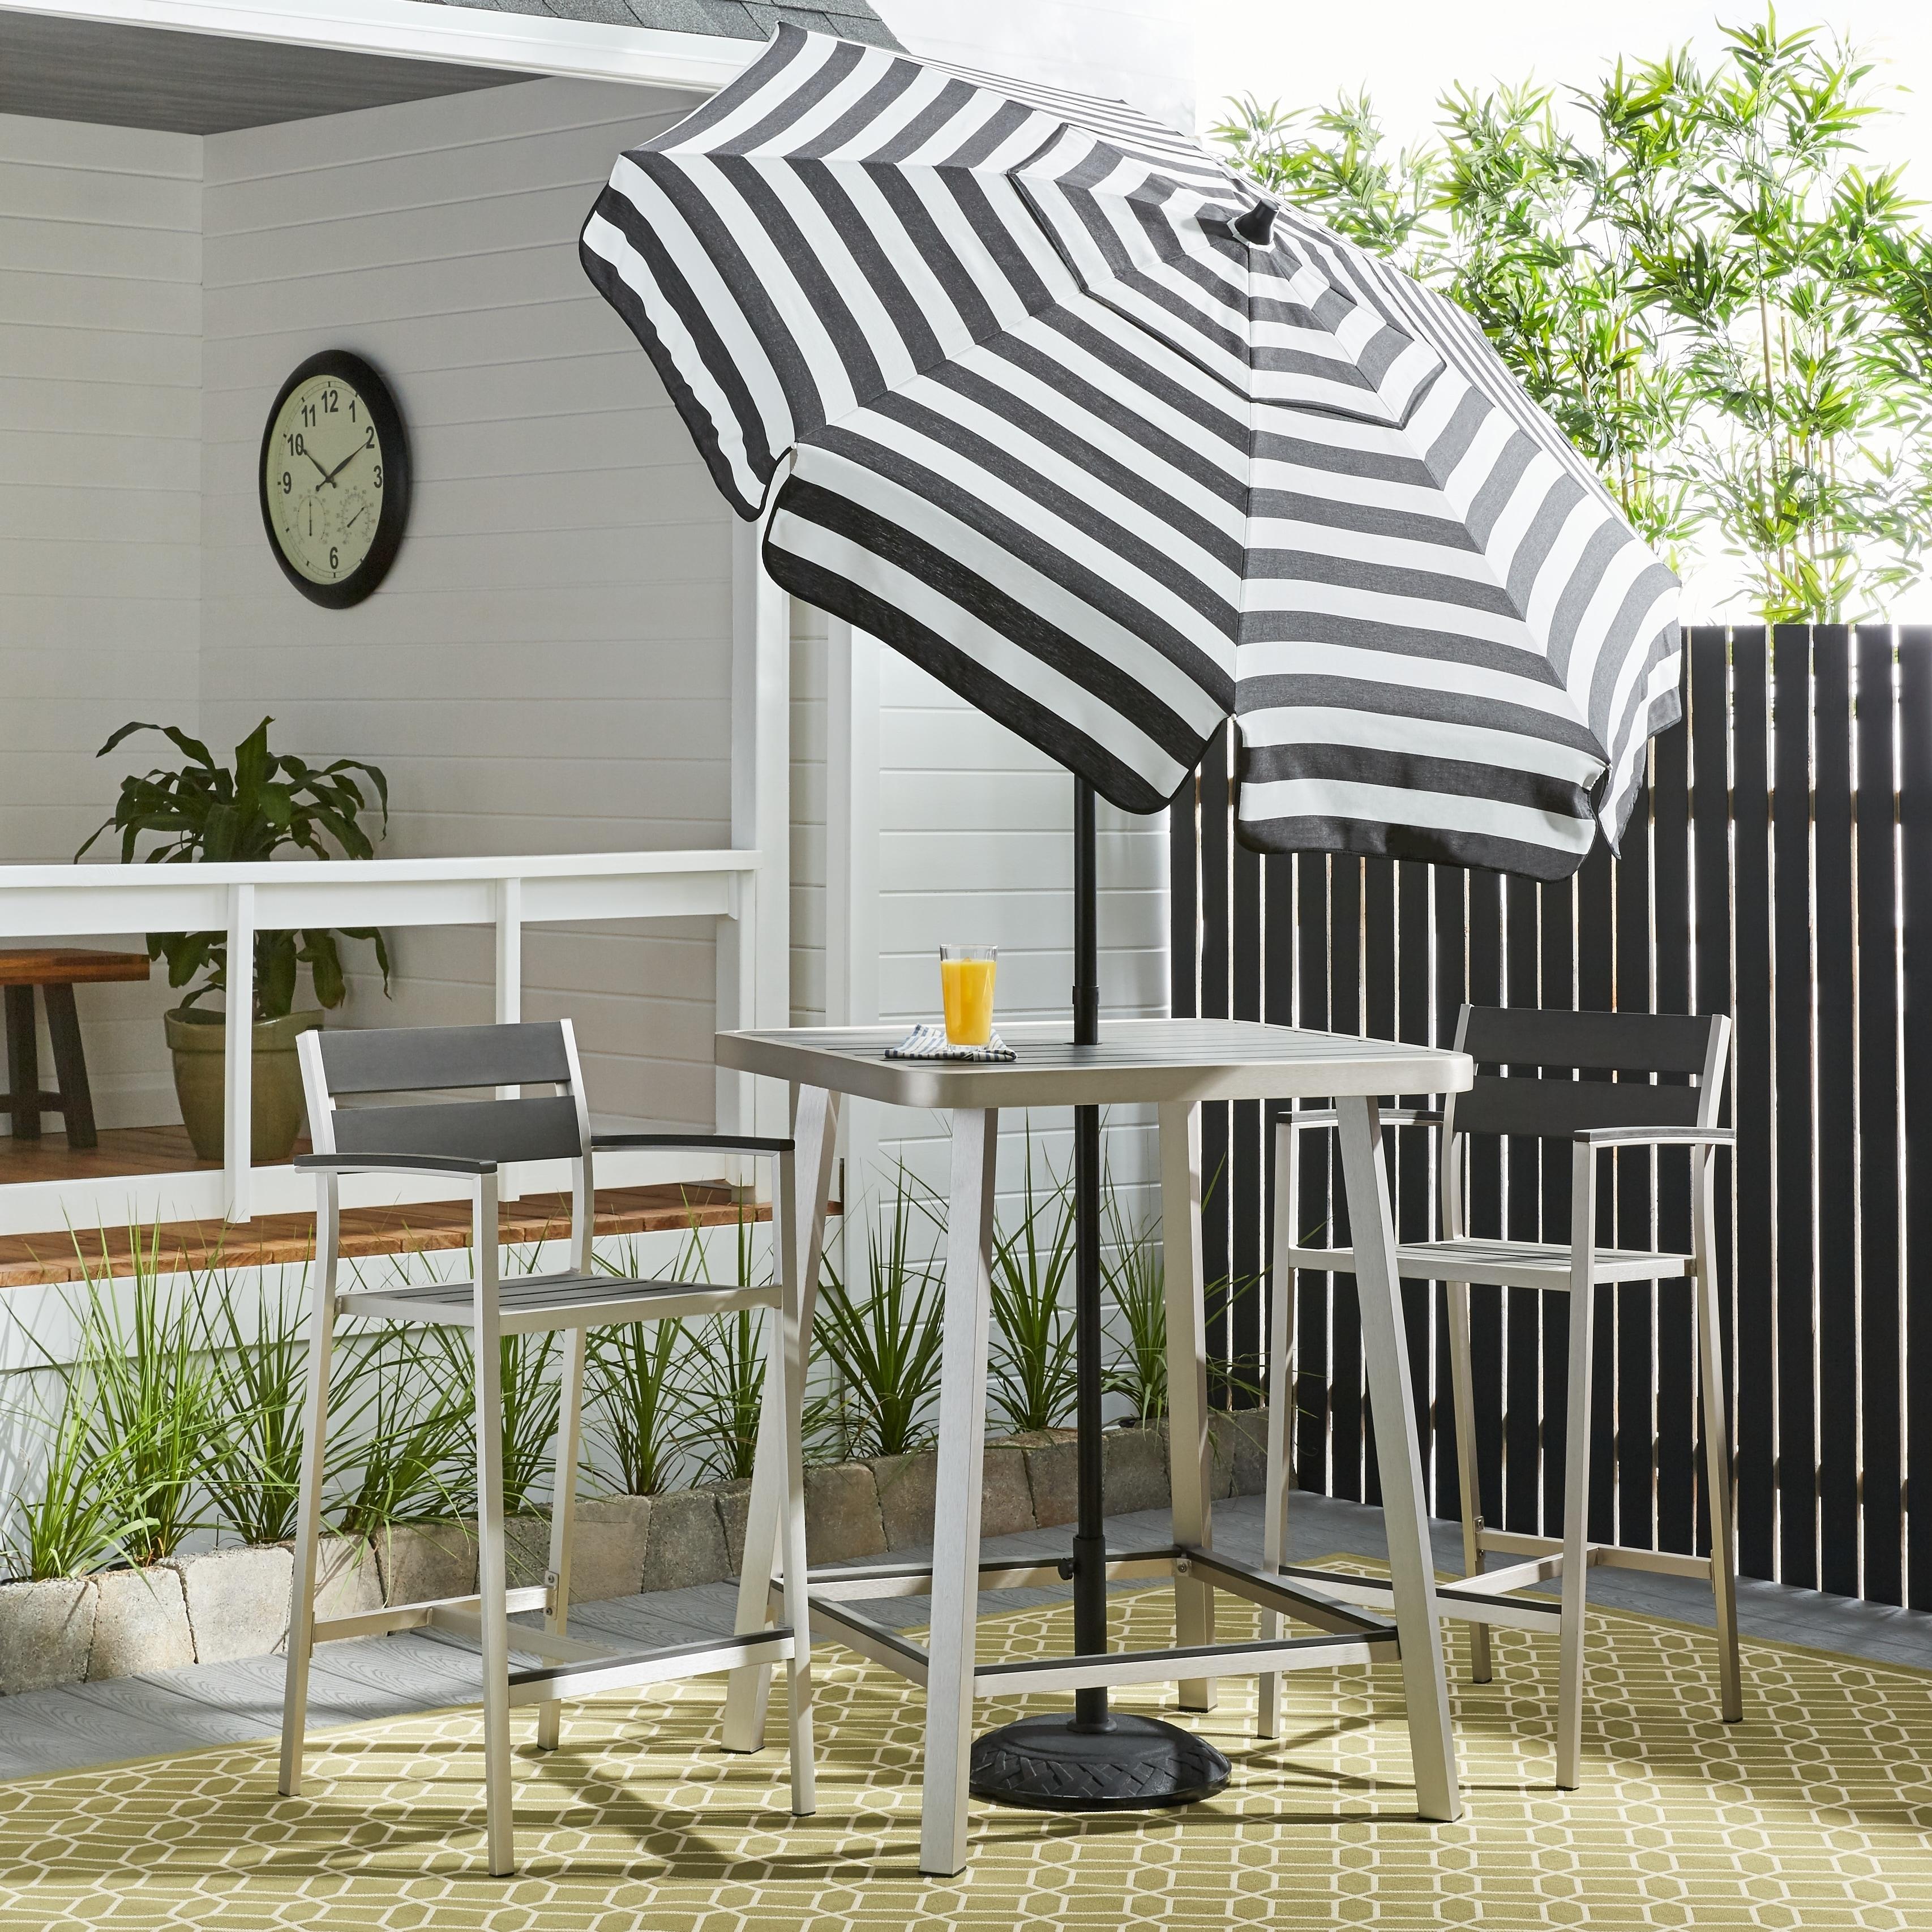 Italian Bistro 6 Foot Acrylic Striped Patio Umbrella Free Shipping Today 9818399